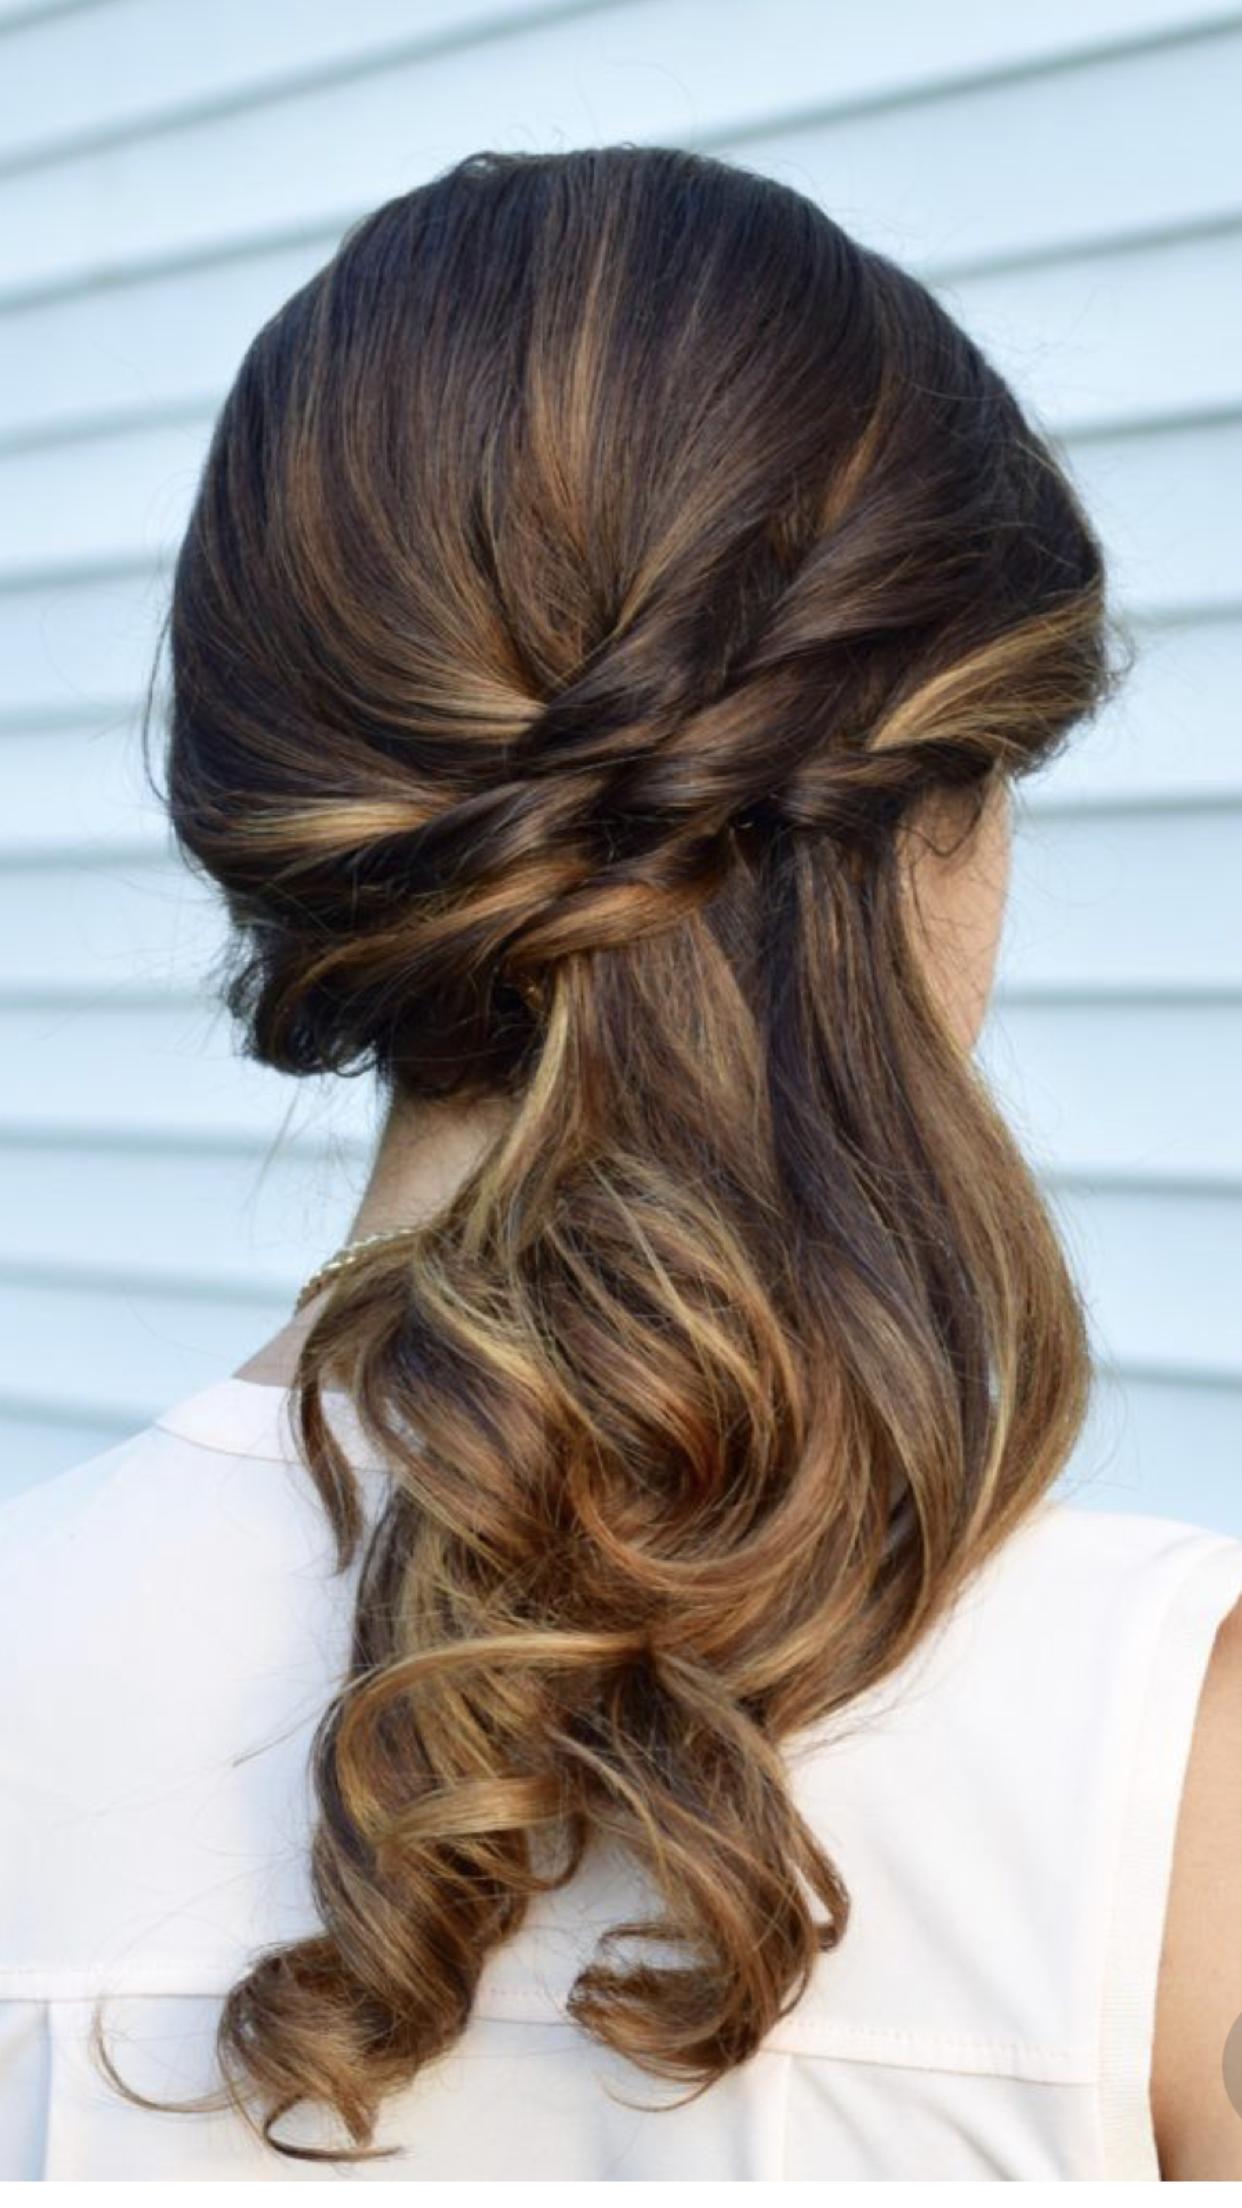 Hermosos Peinados Side Ponytail Wedding Hairstyles Side Ponytail Hairstyles Bridesmaid Hair Side